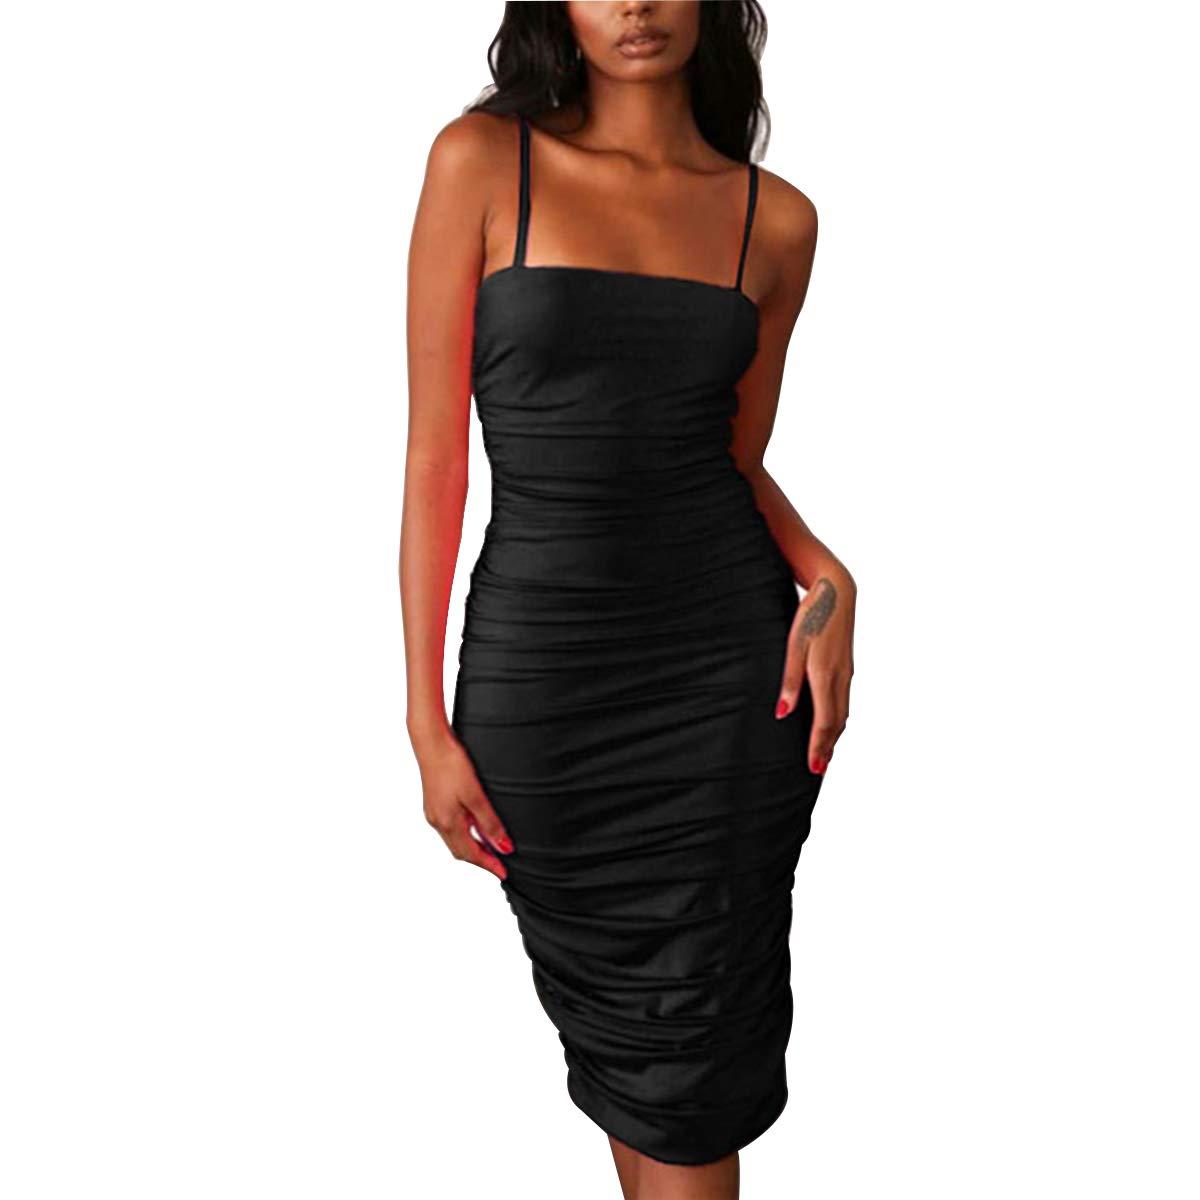 a69c764a46 LUFENG Women s Long Sleeve High Neck Zipper Bodycon Slim Fit Dress at  Amazon Women s Clothing store